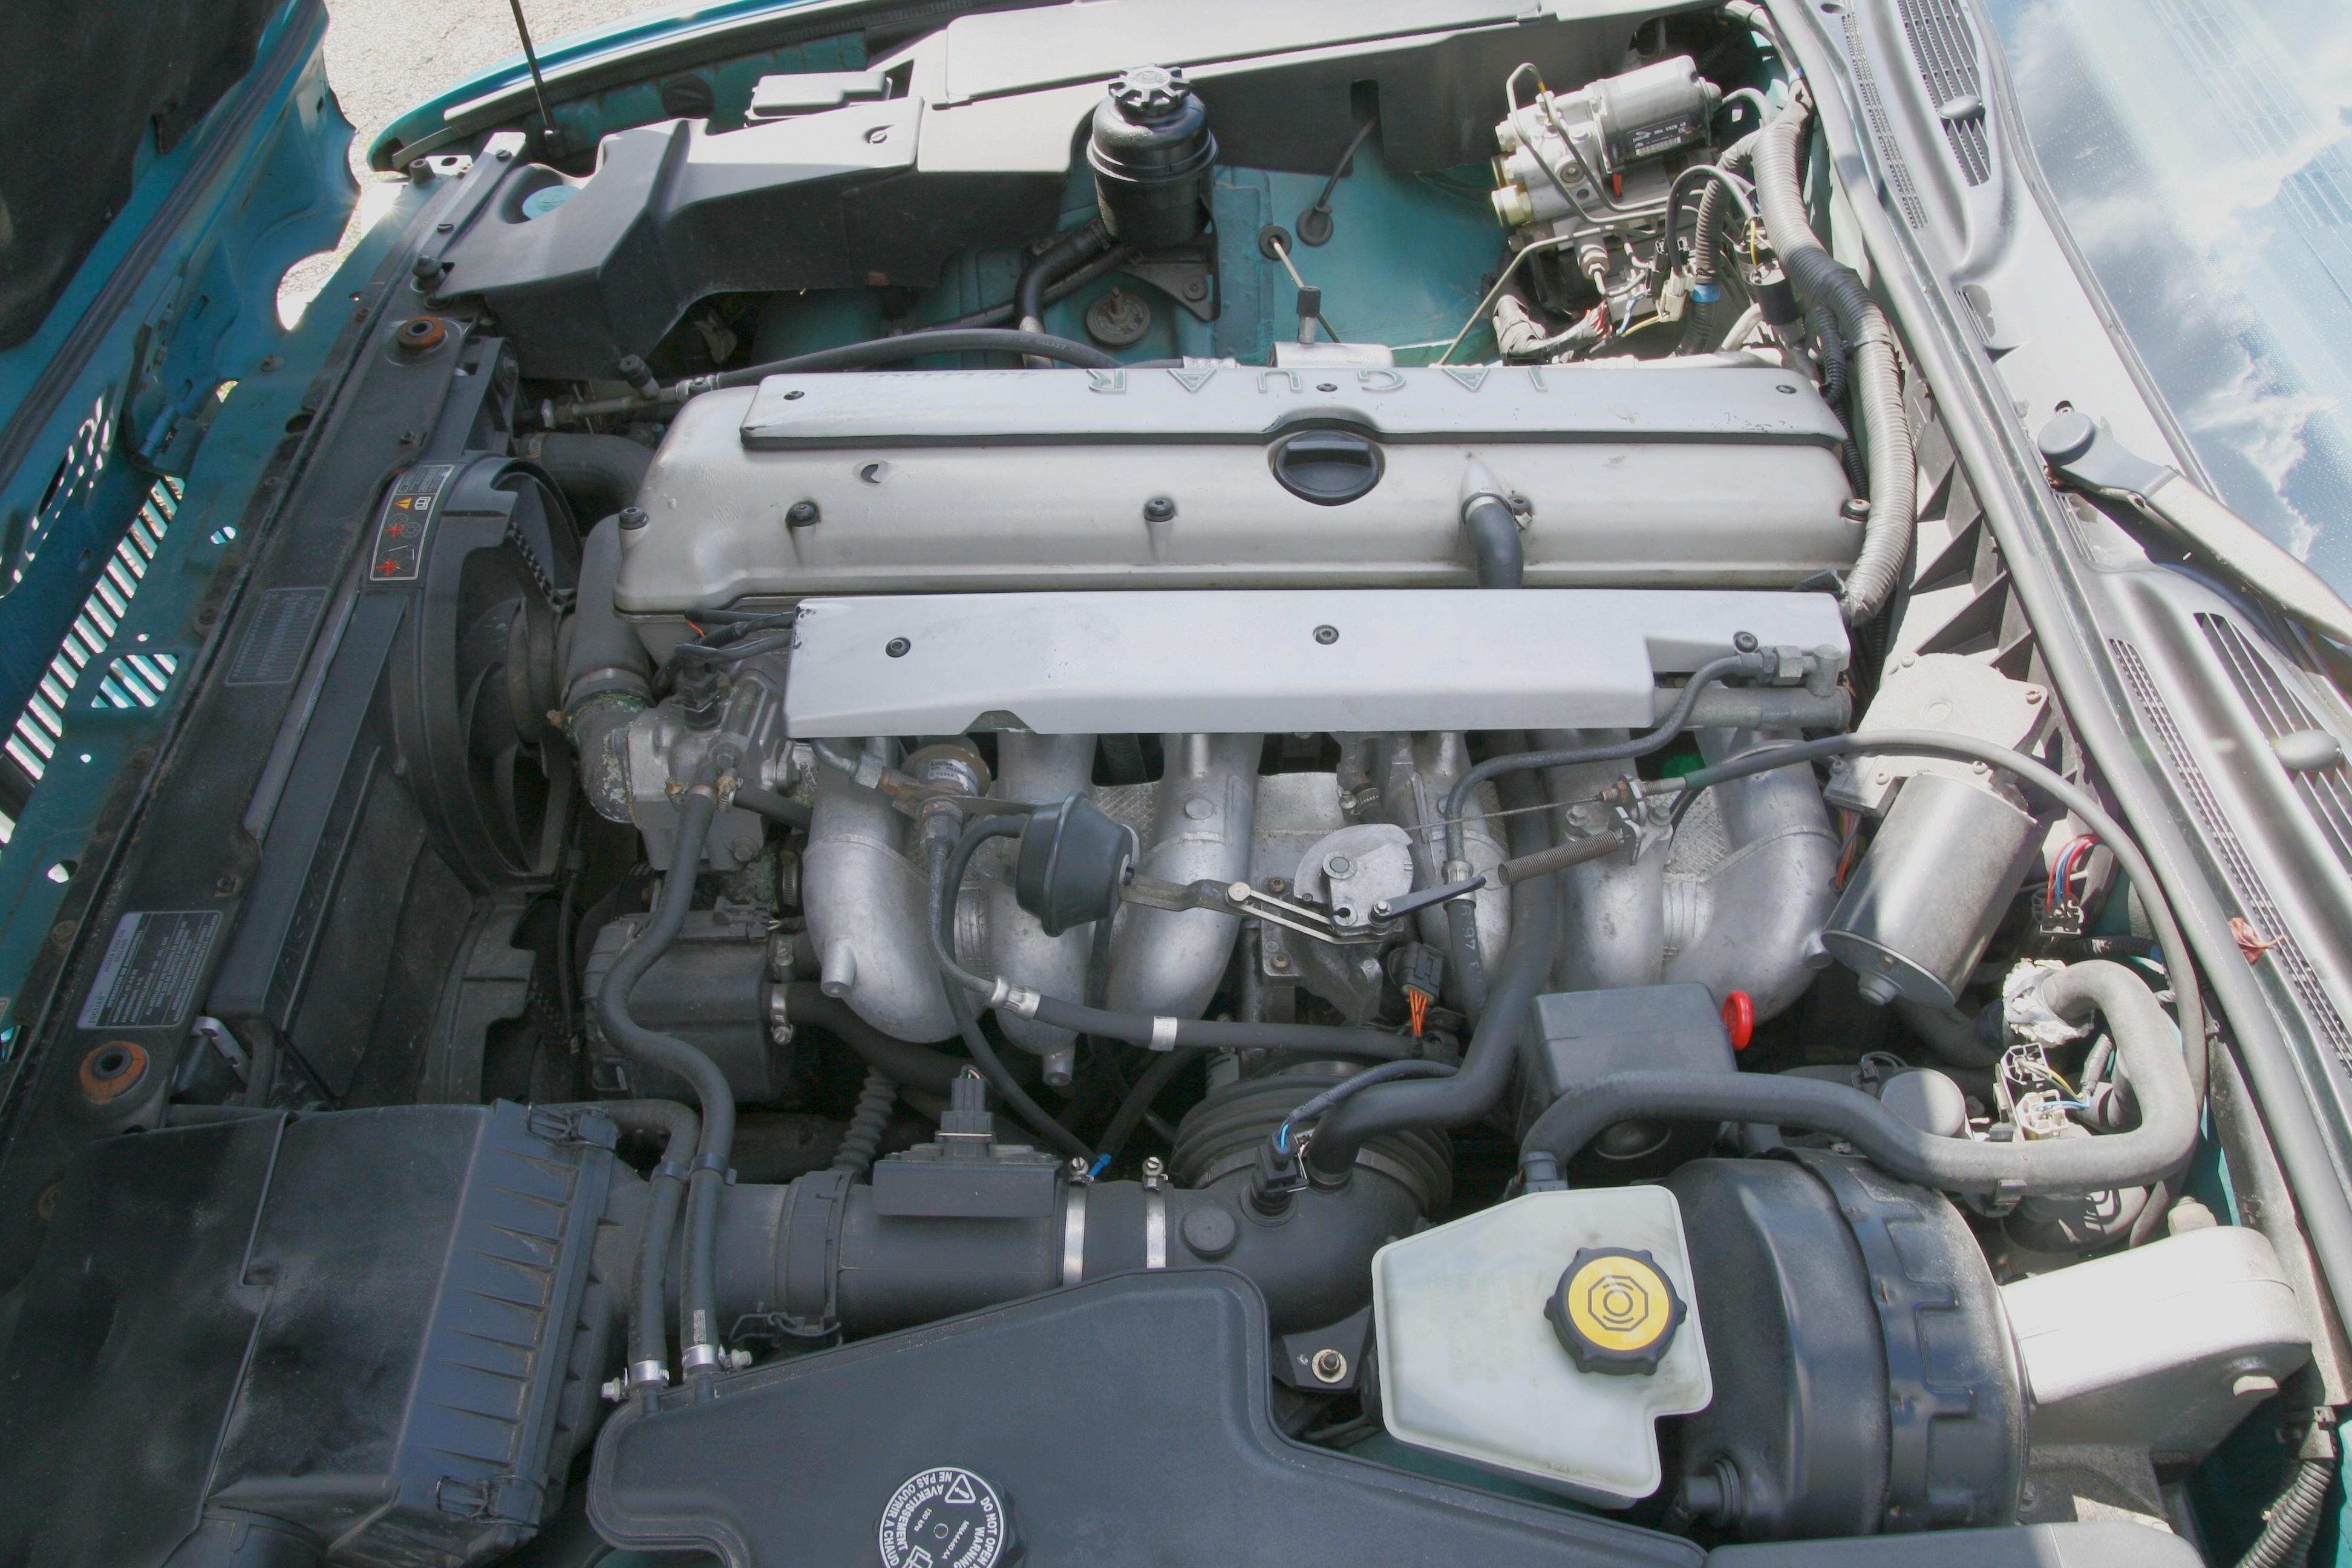 jaguar aj16 engine diagrams jaguar 4 0 v8 engine diagrams #3